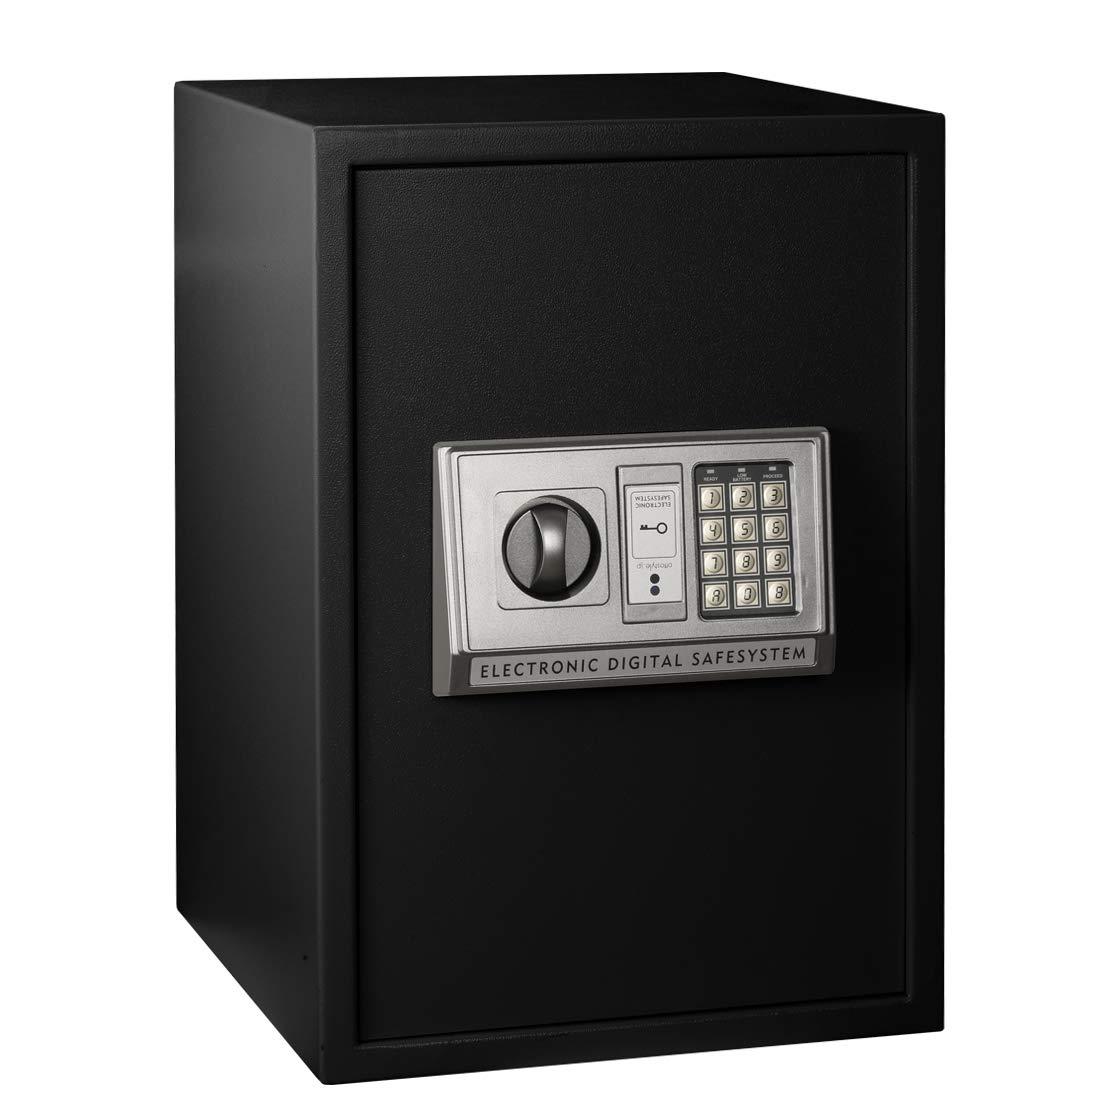 Suptools Digital Safe-Electronic Steel Safe Box Fireproof Safe with Digital Keypad for Home, Business or Travel by (2.3 Cubic Feet,Black)